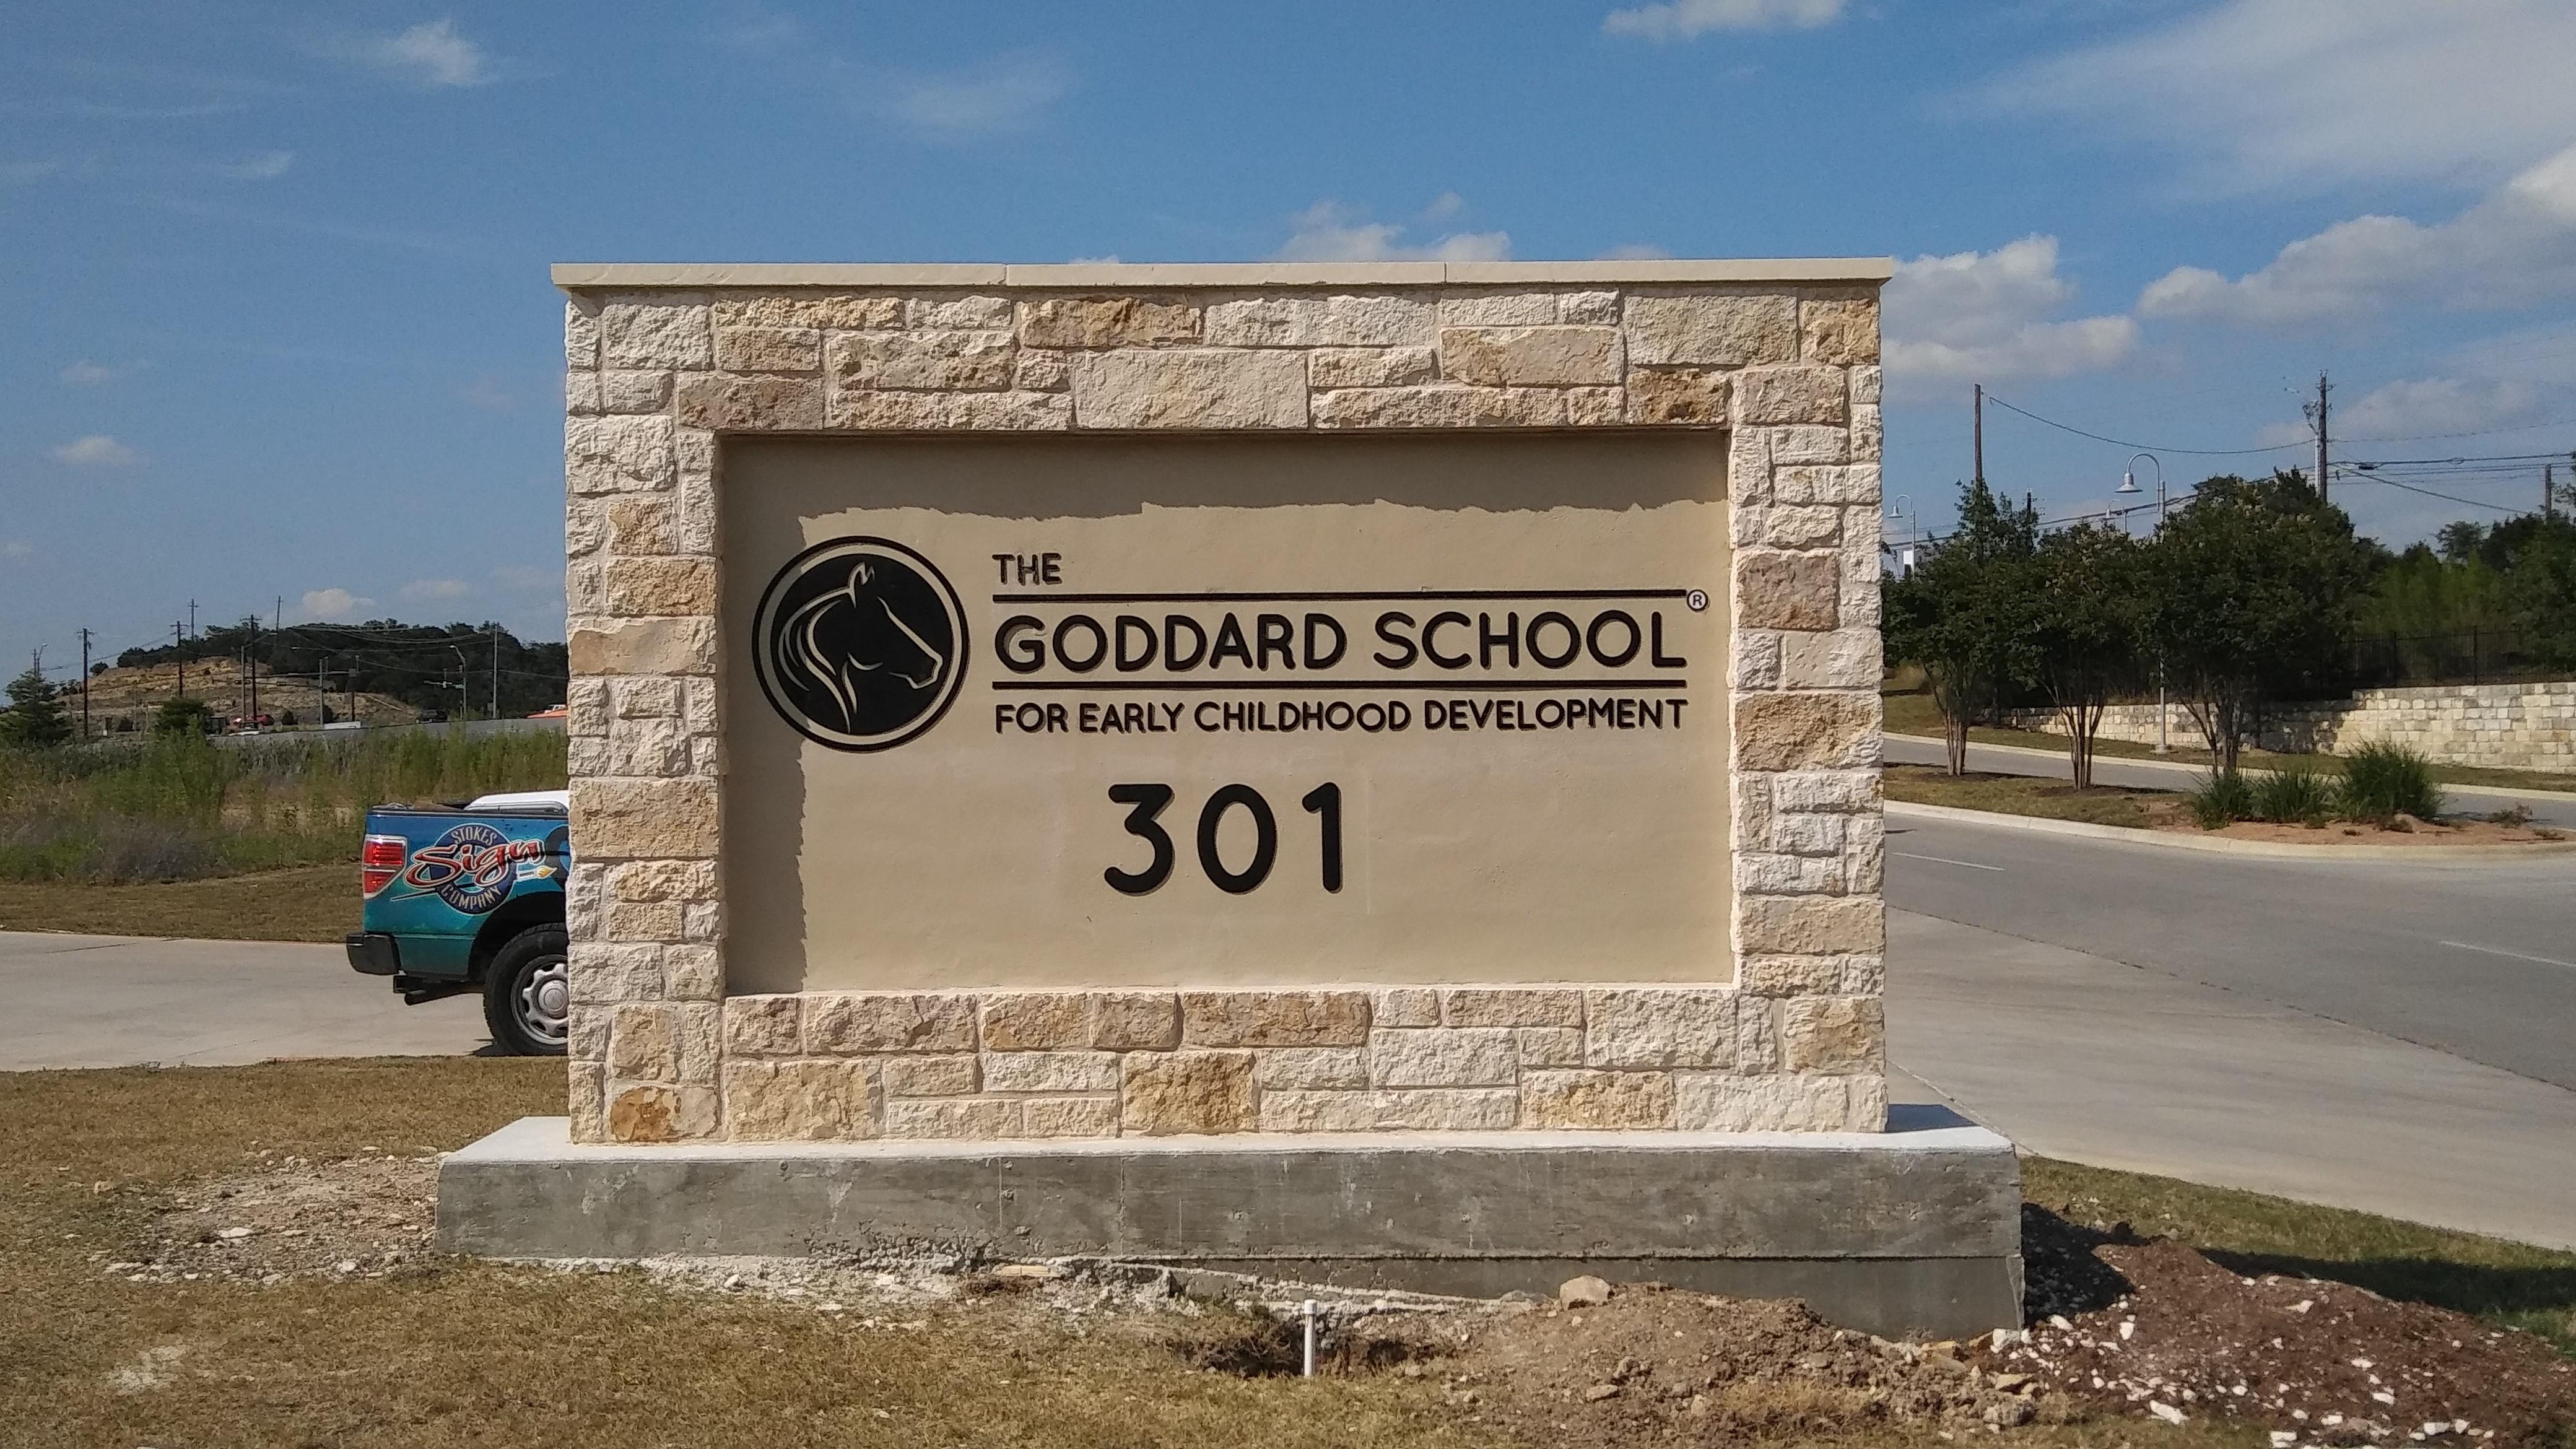 Goddard School Monument LK49451